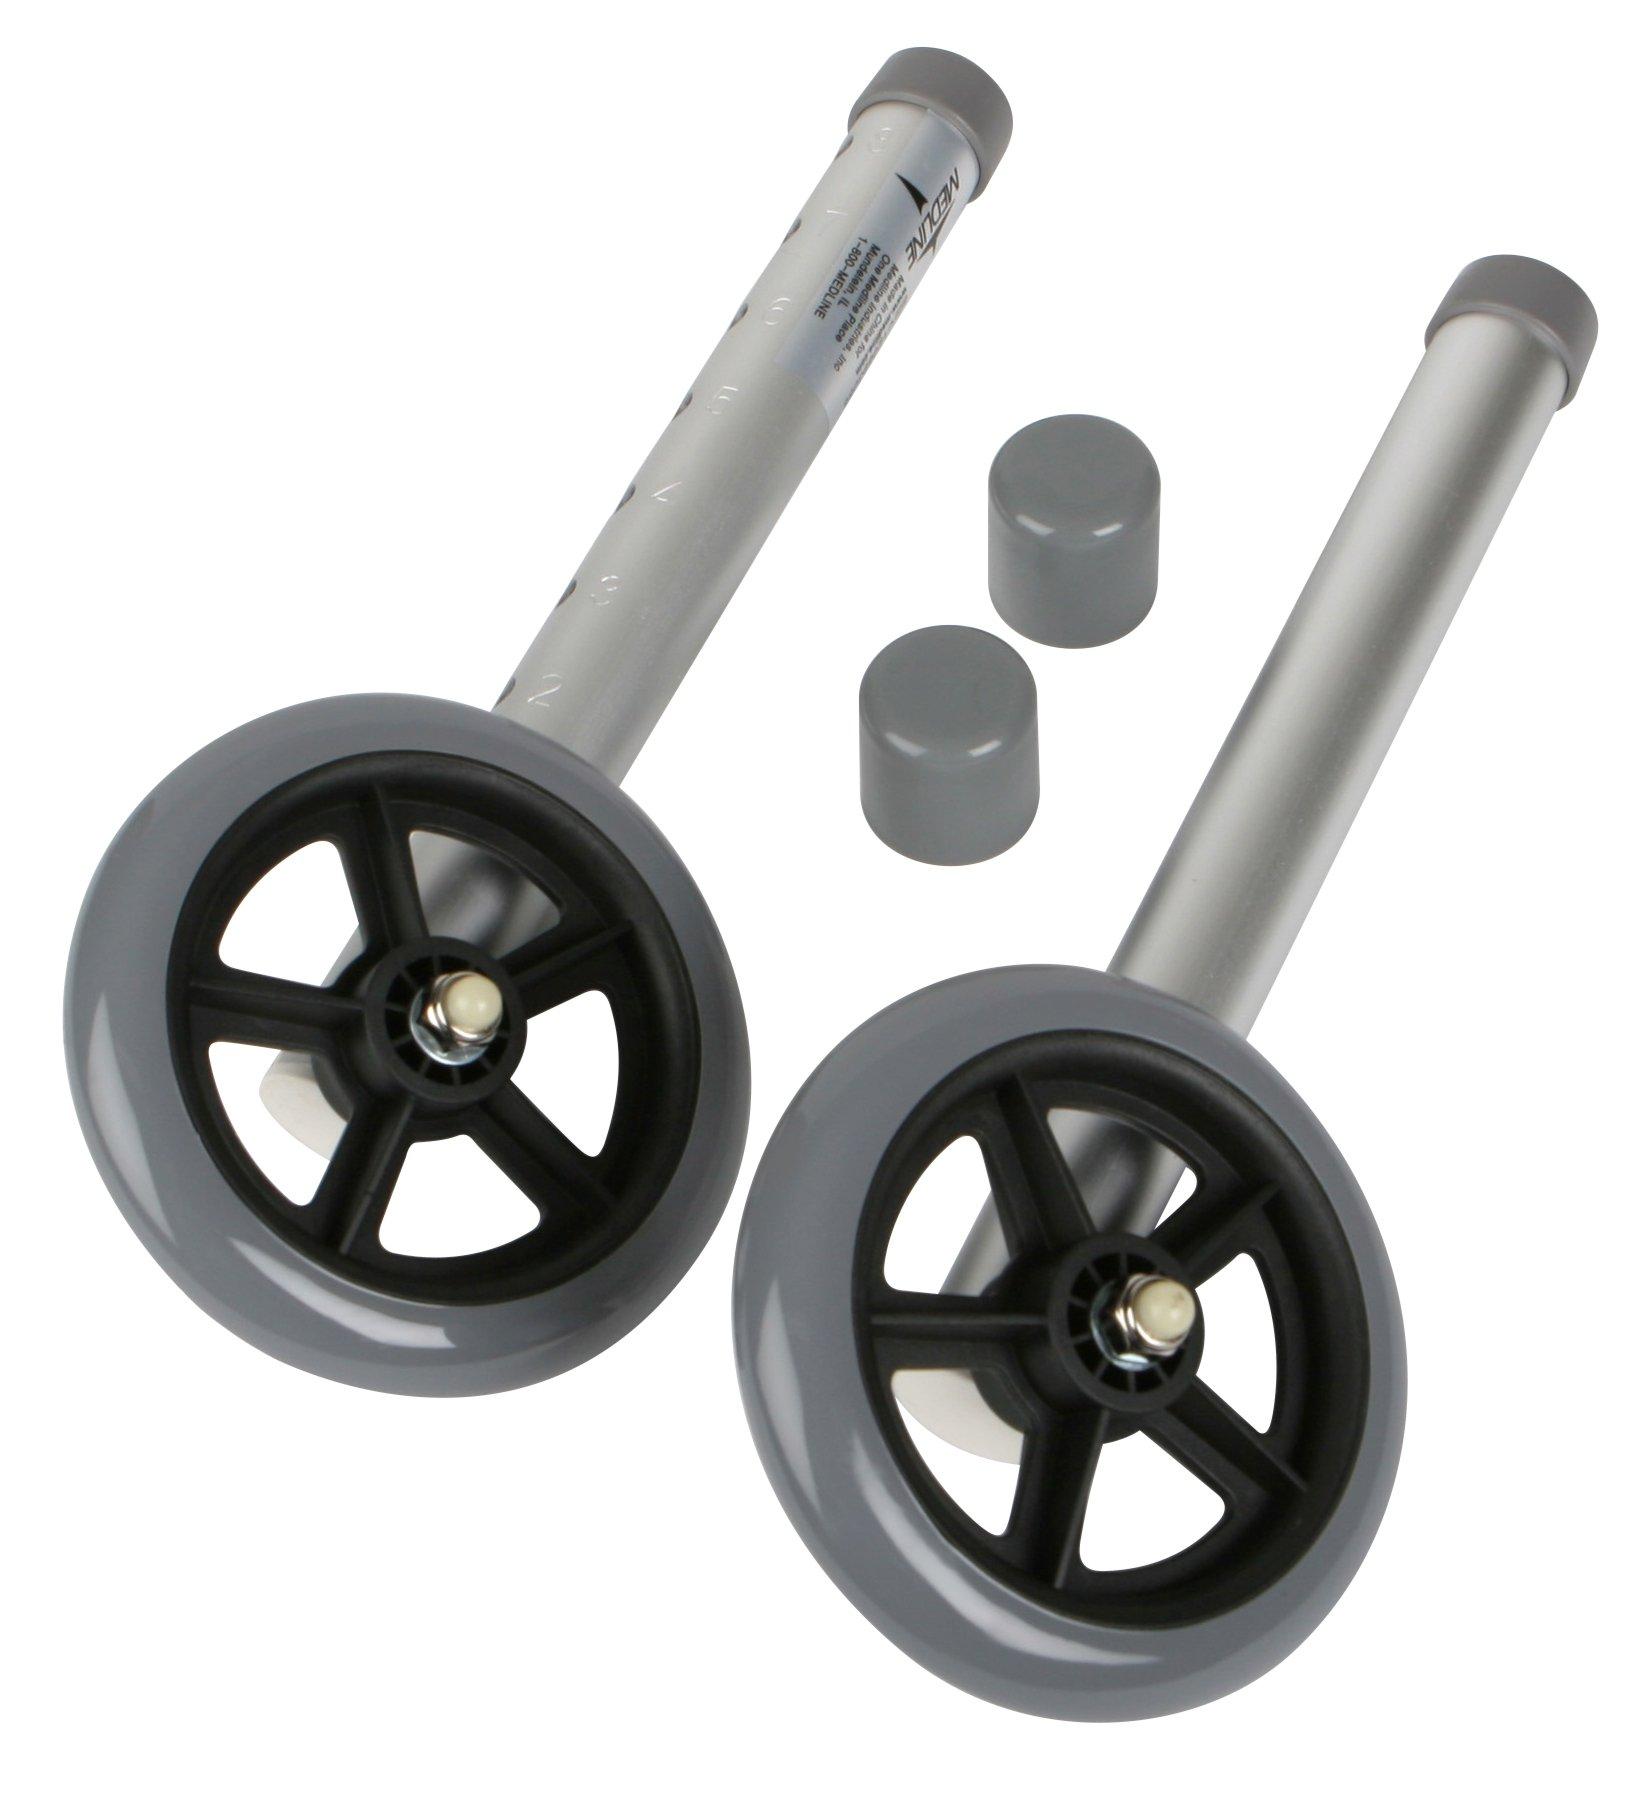 Medline 5'' Walker Wheels for 2 Button Walker